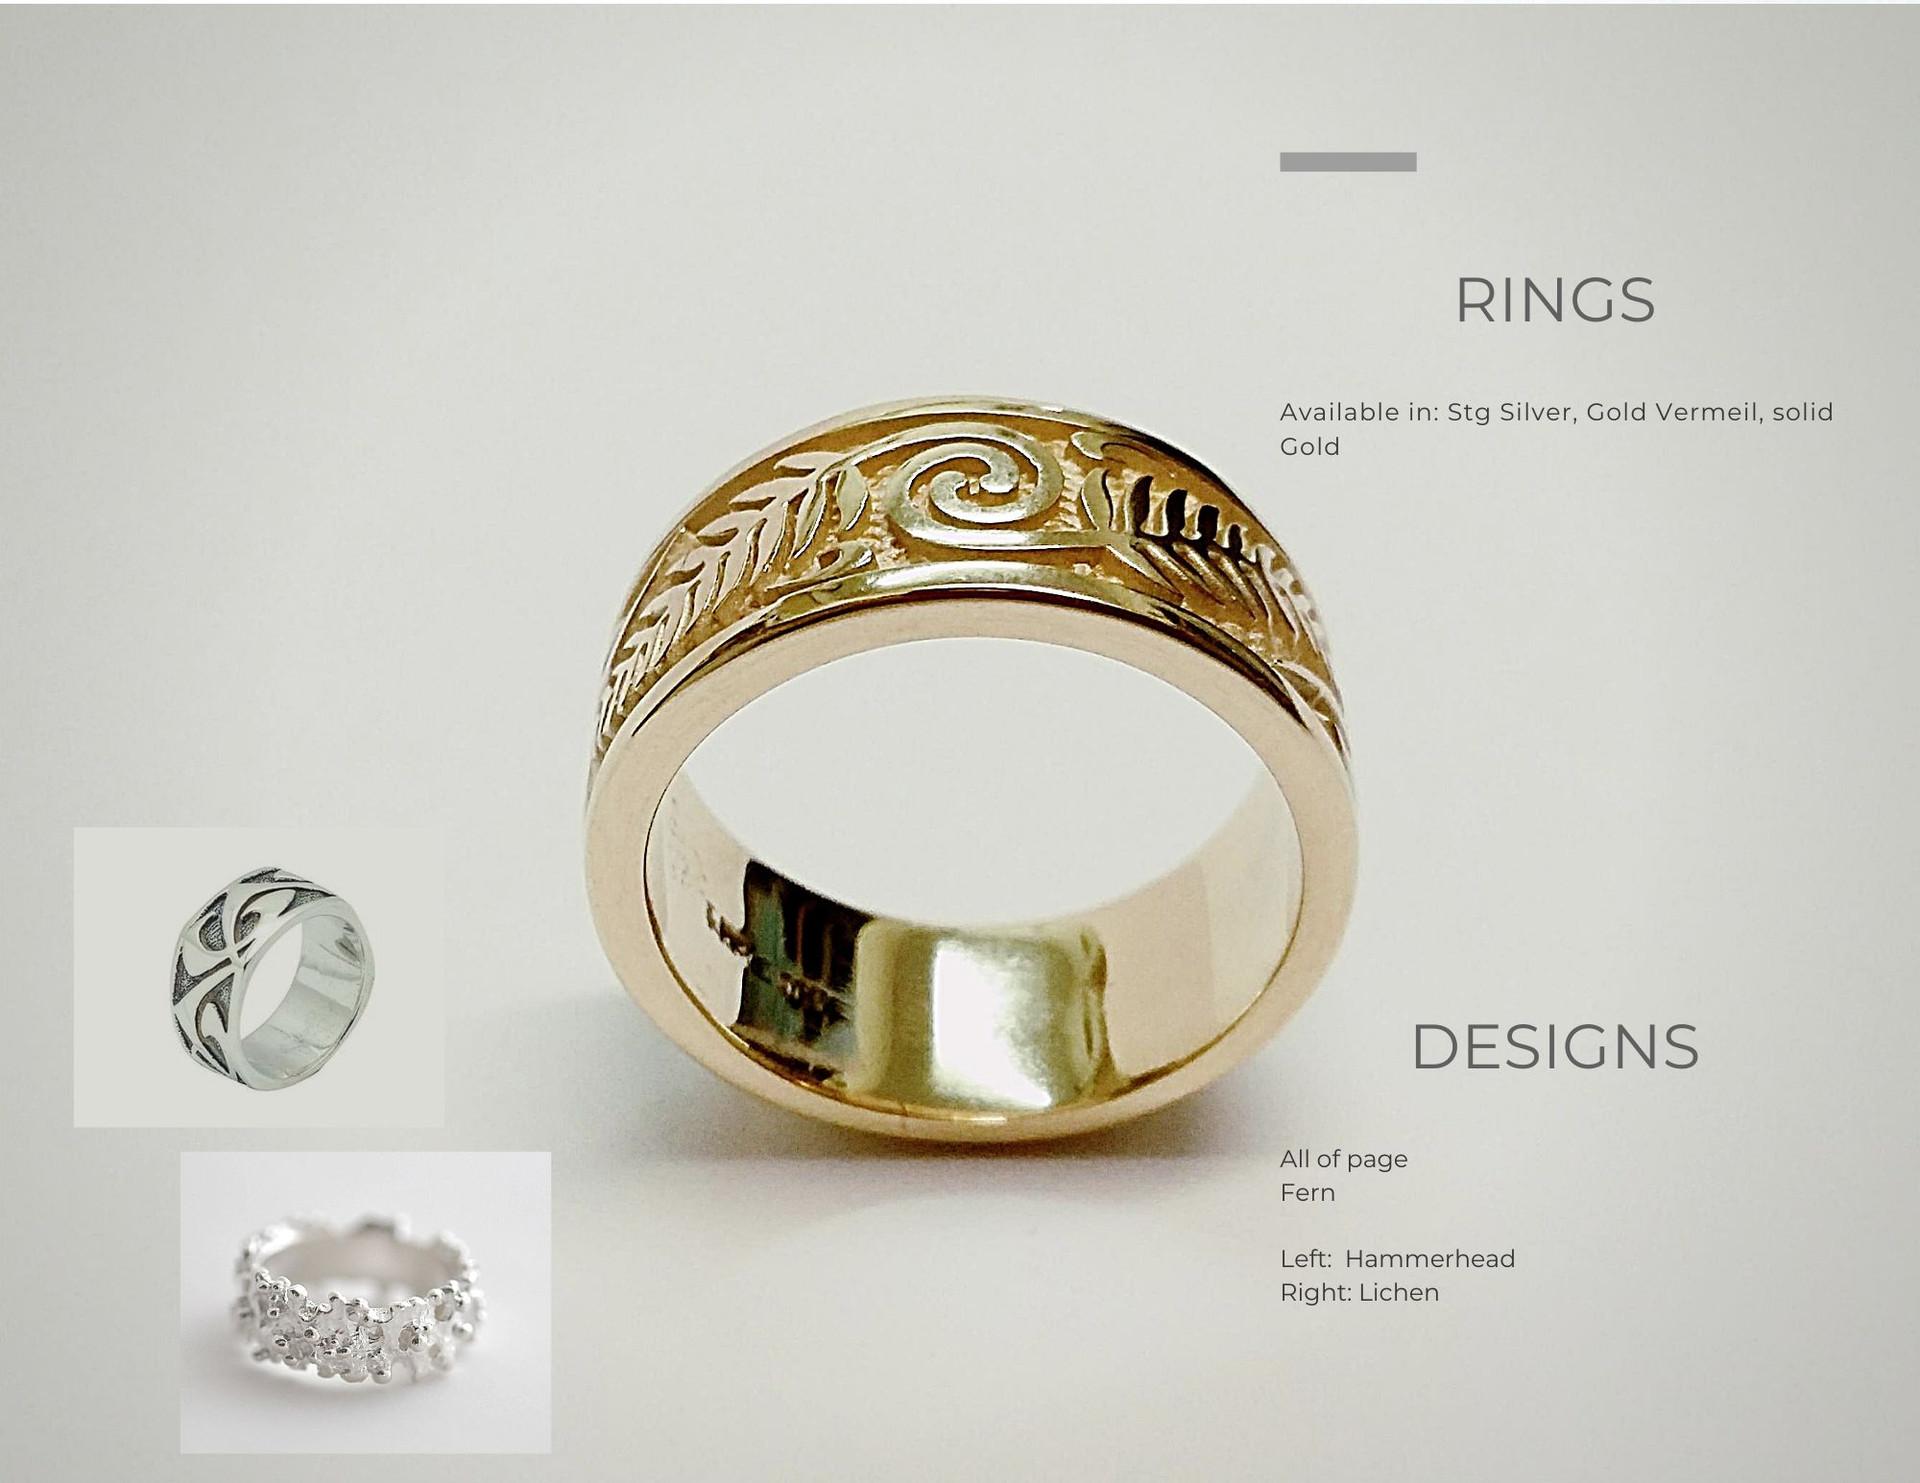 Fern Design